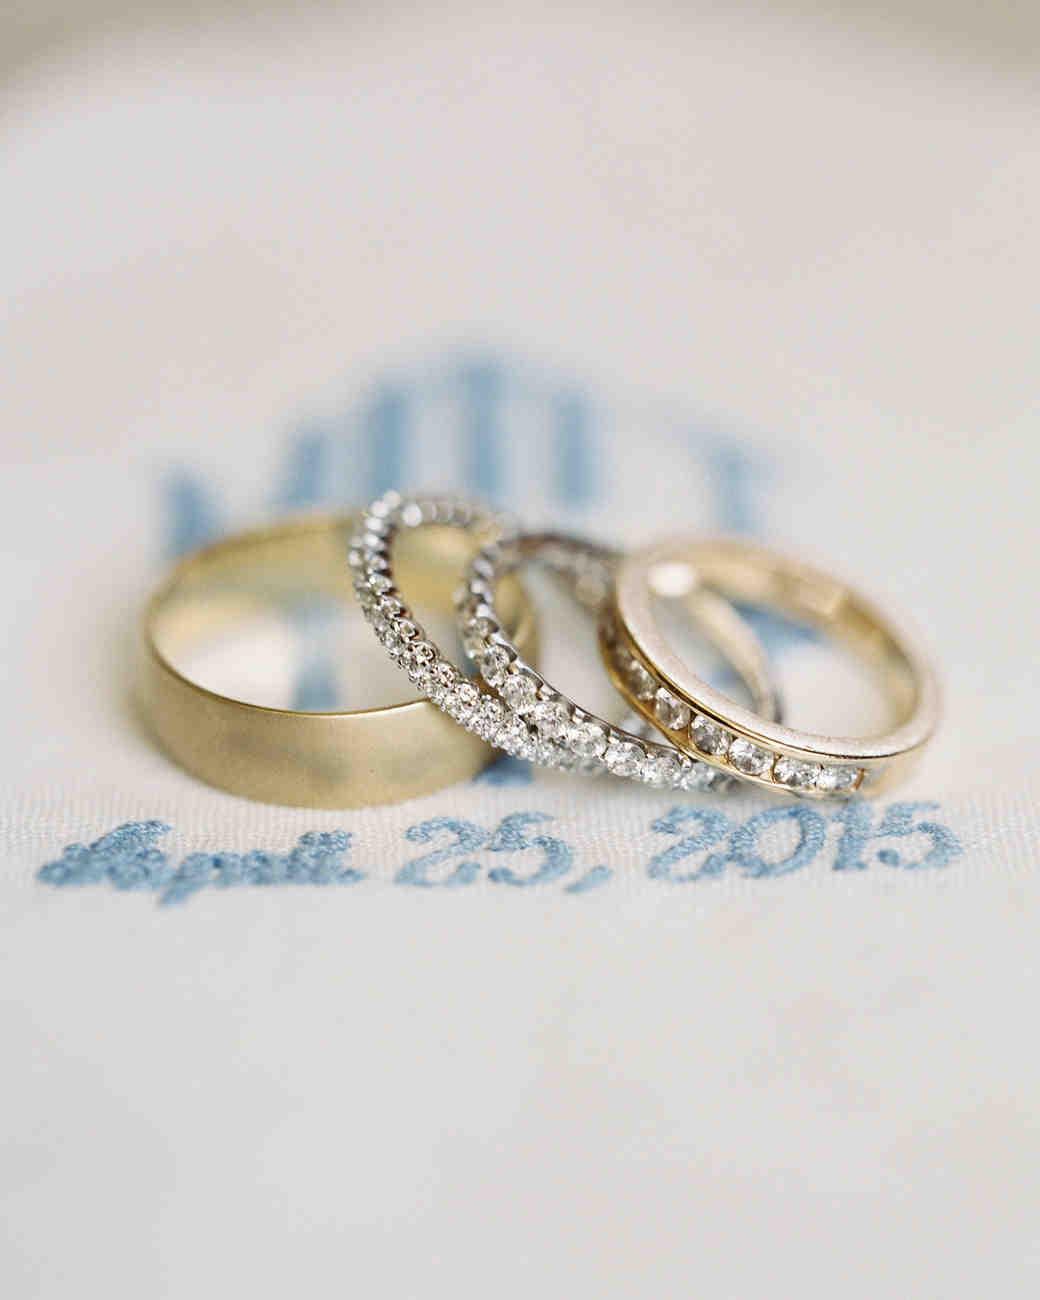 mackenzie-ian-wedding-rings-015-s112461-0116.jpg